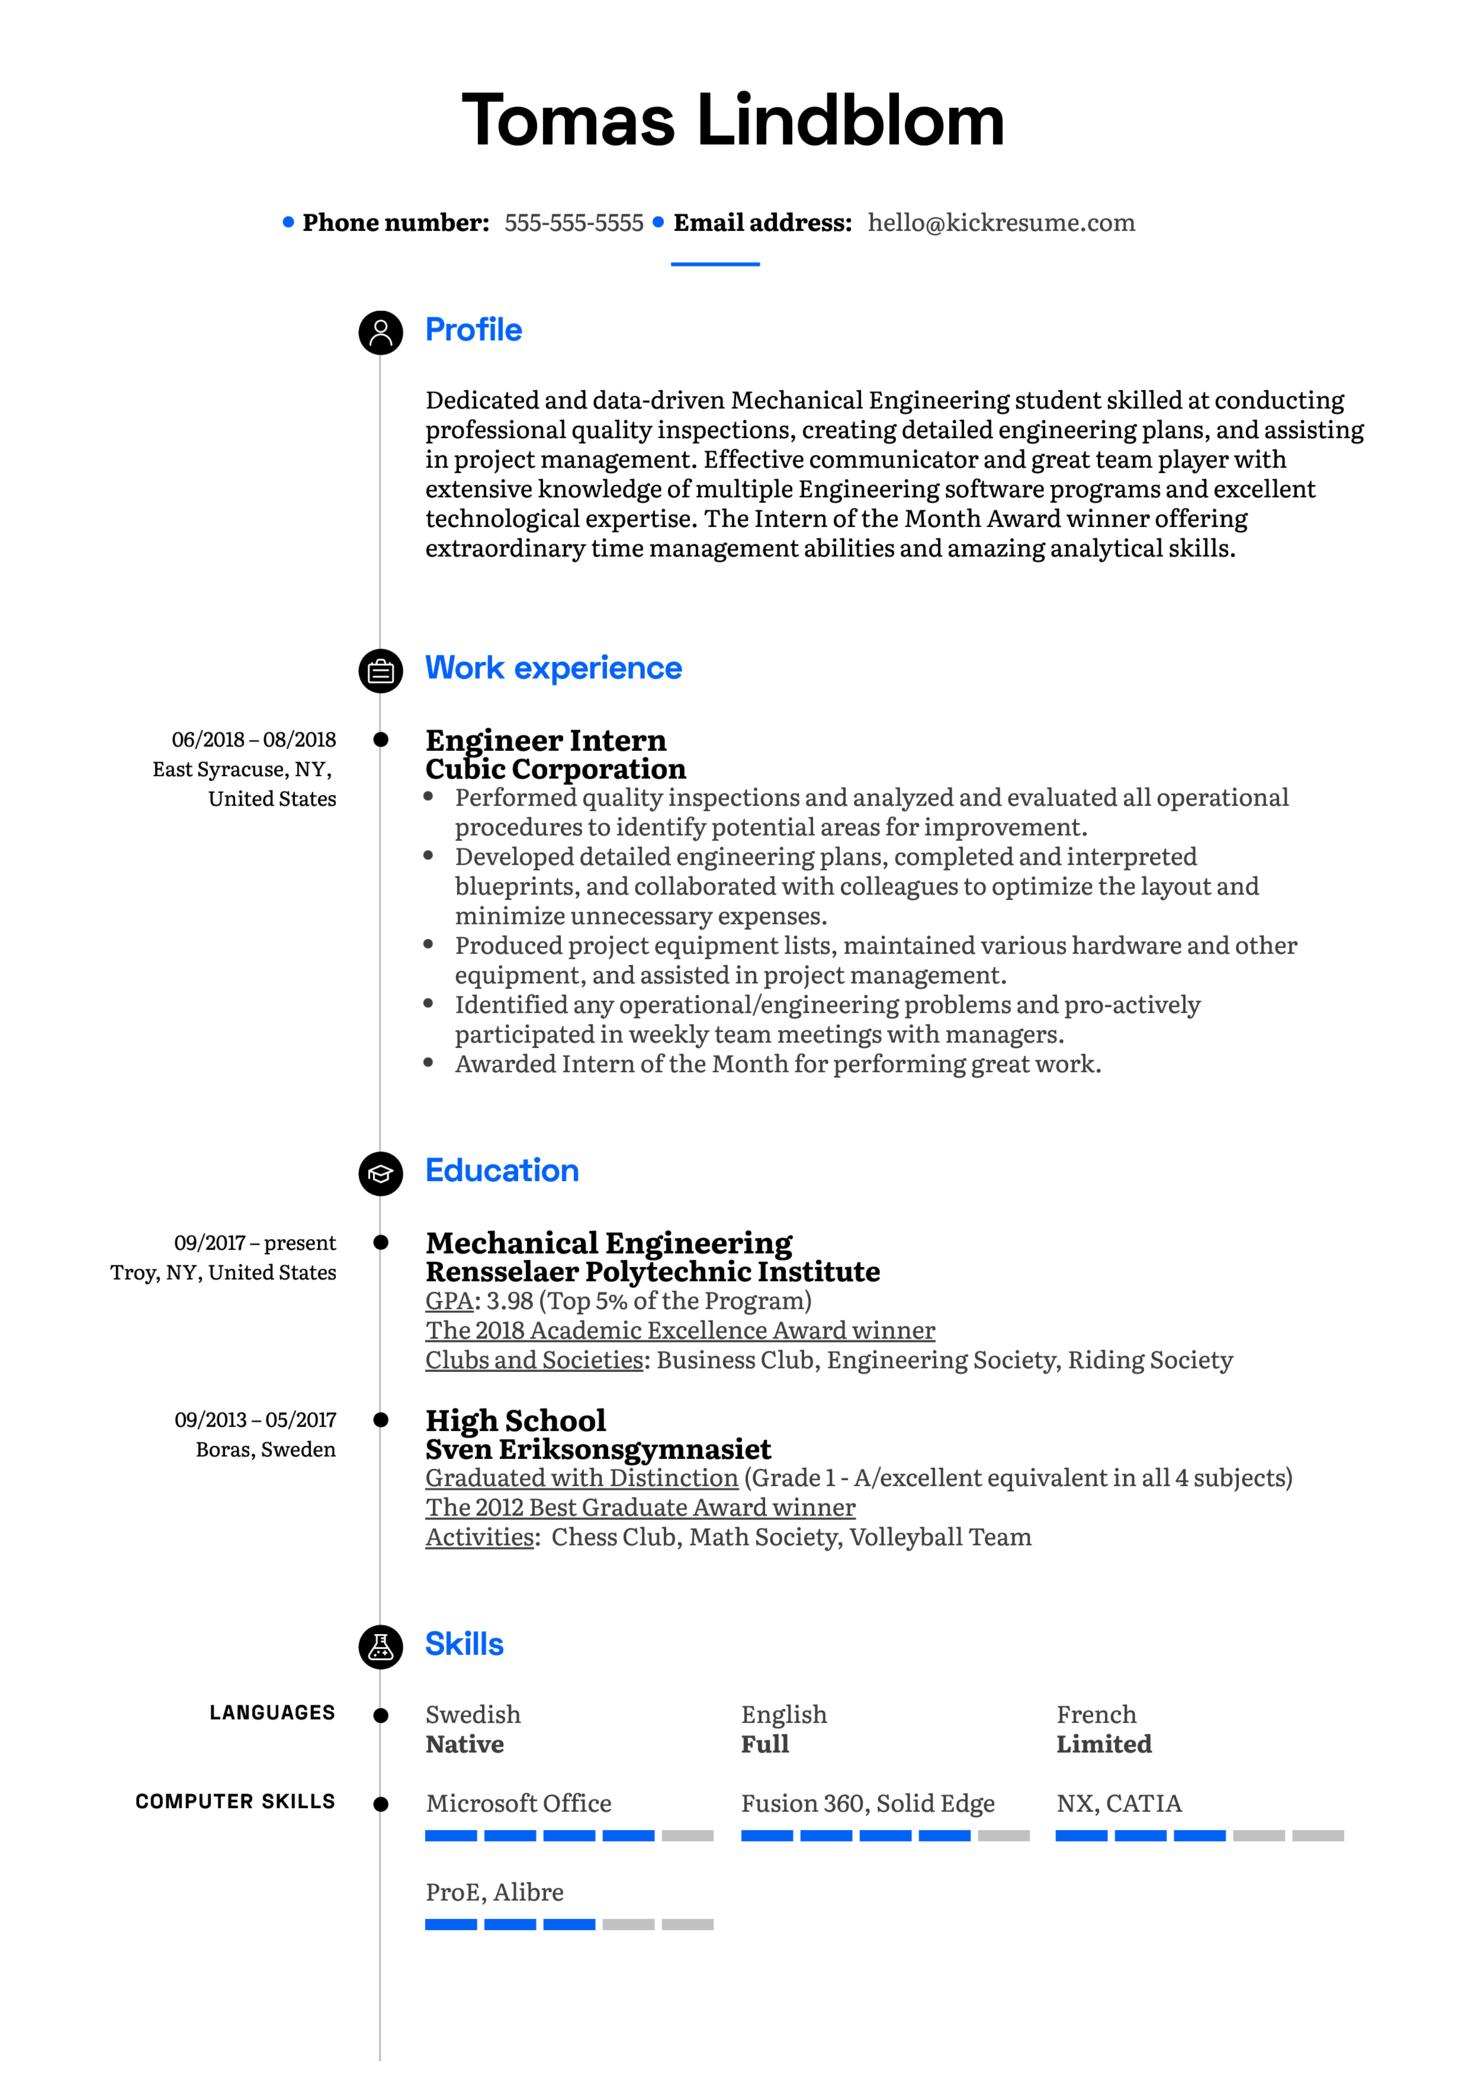 Engineer Intern Resume Example (Part 1)